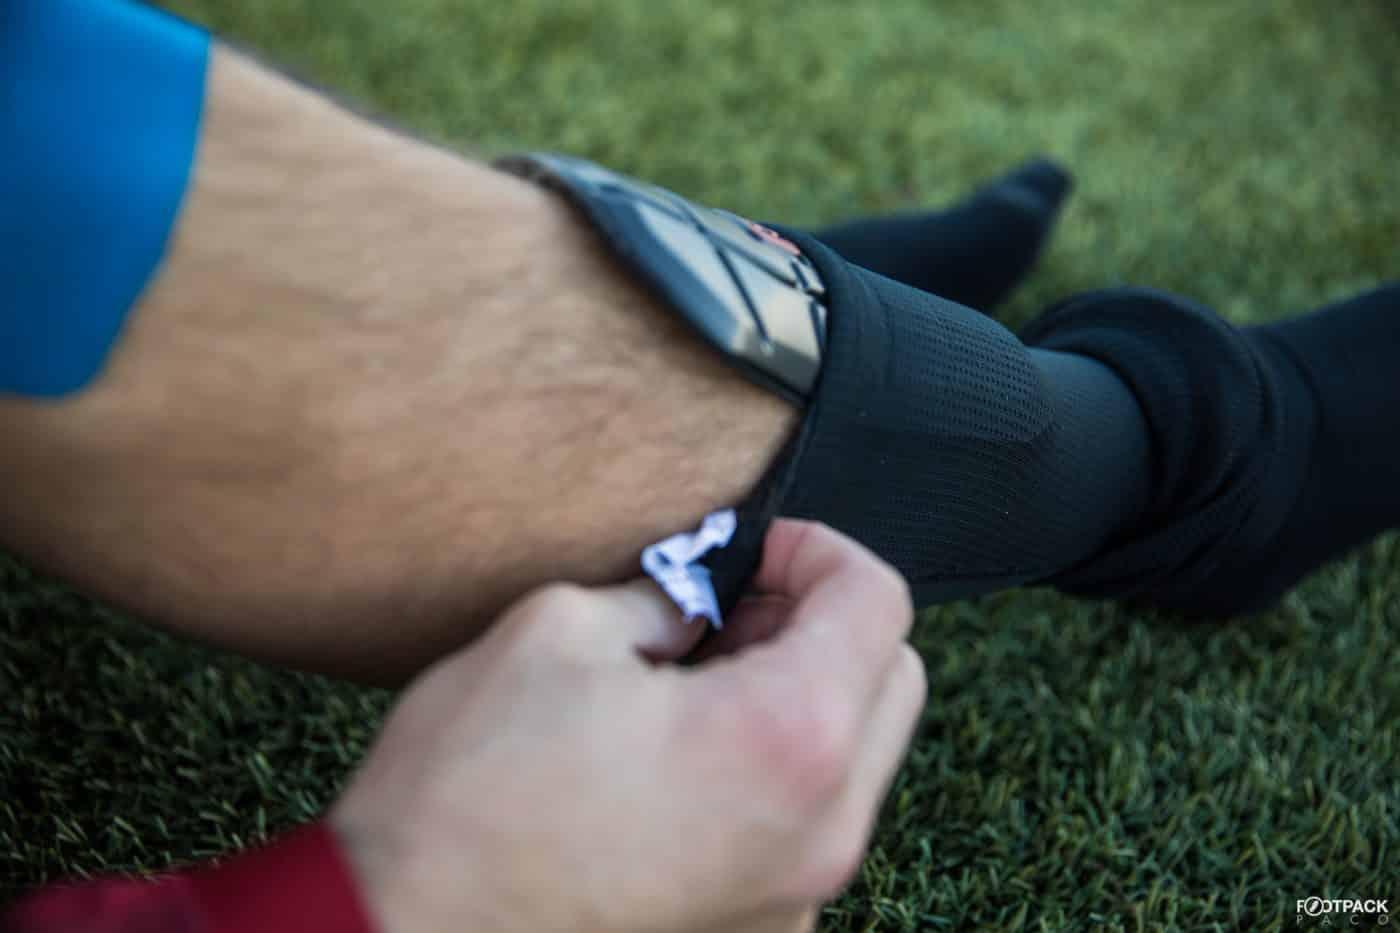 test-avis-protege-tibias-g-form-footpack-4